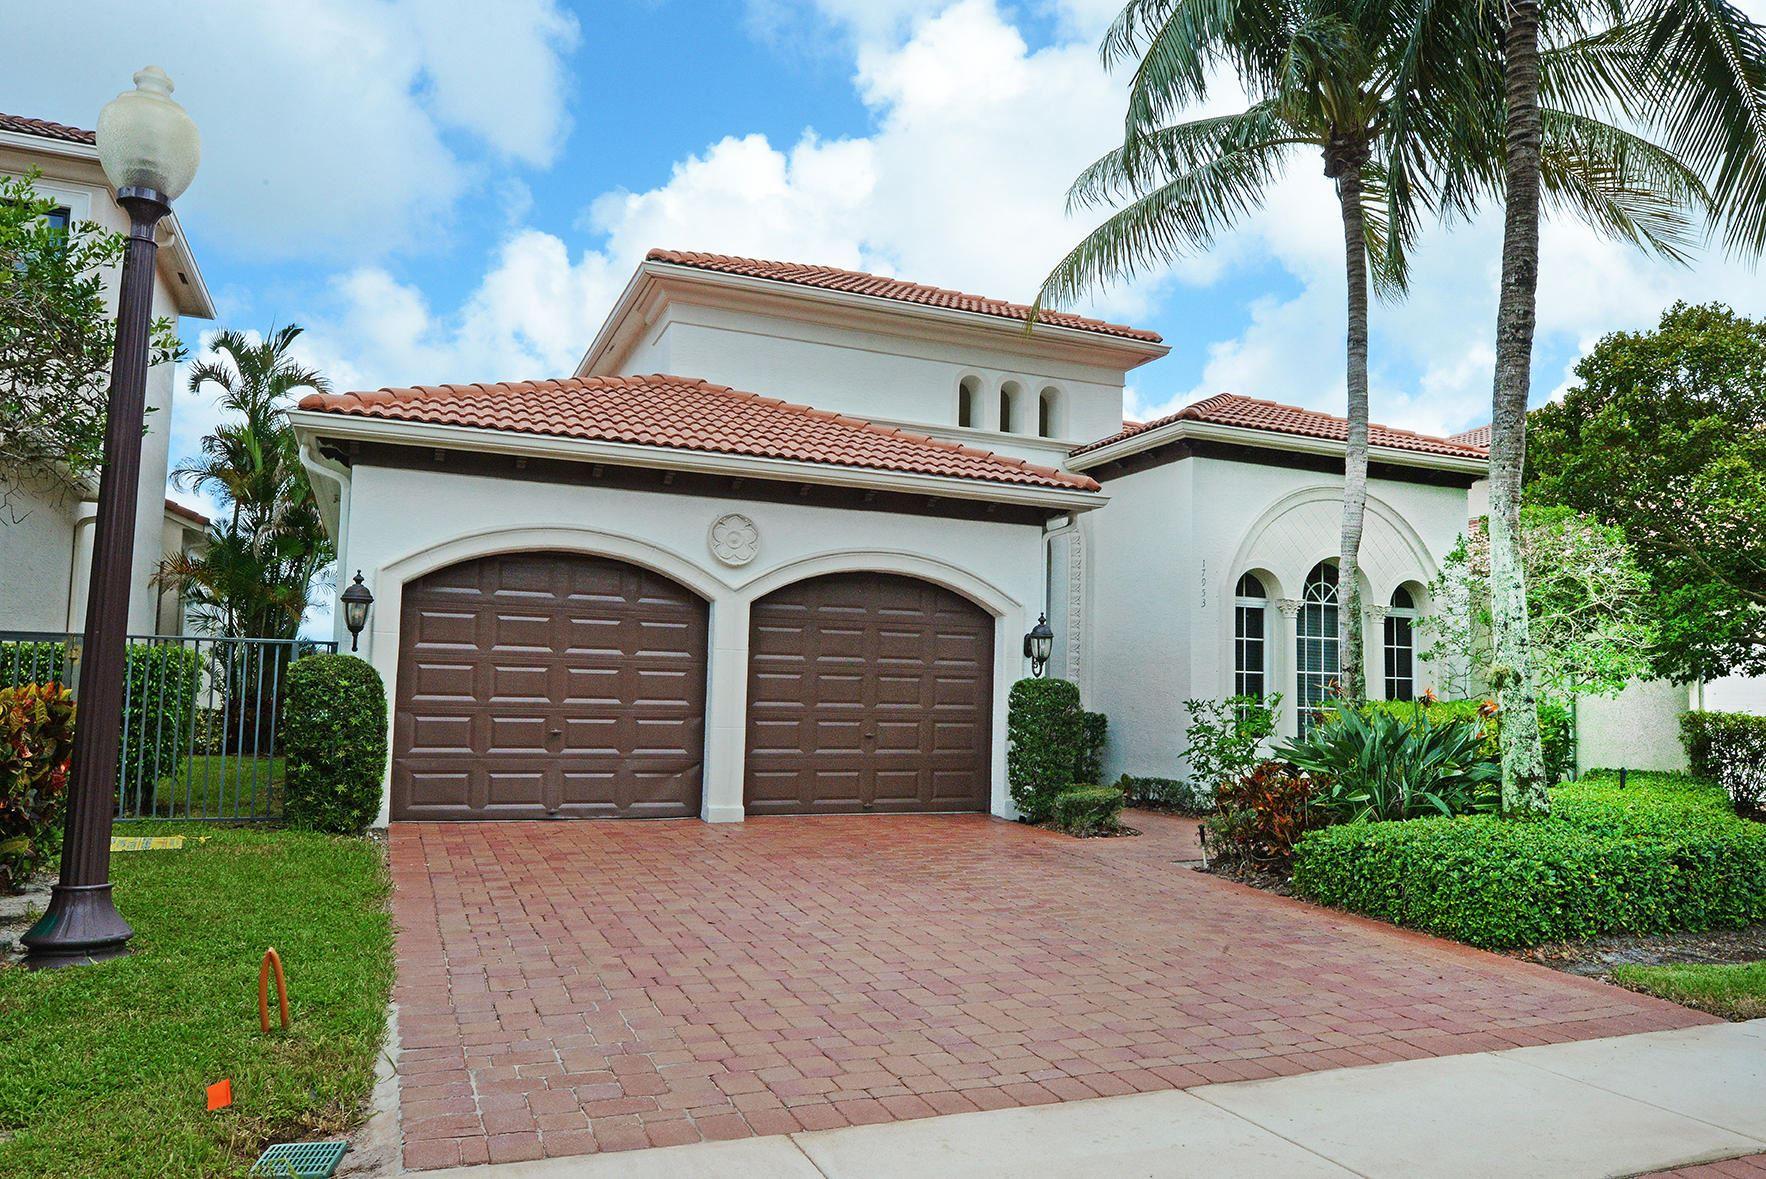 17953 Villa Club Way, Boca Raton, FL 33496 - #: RX-10650552